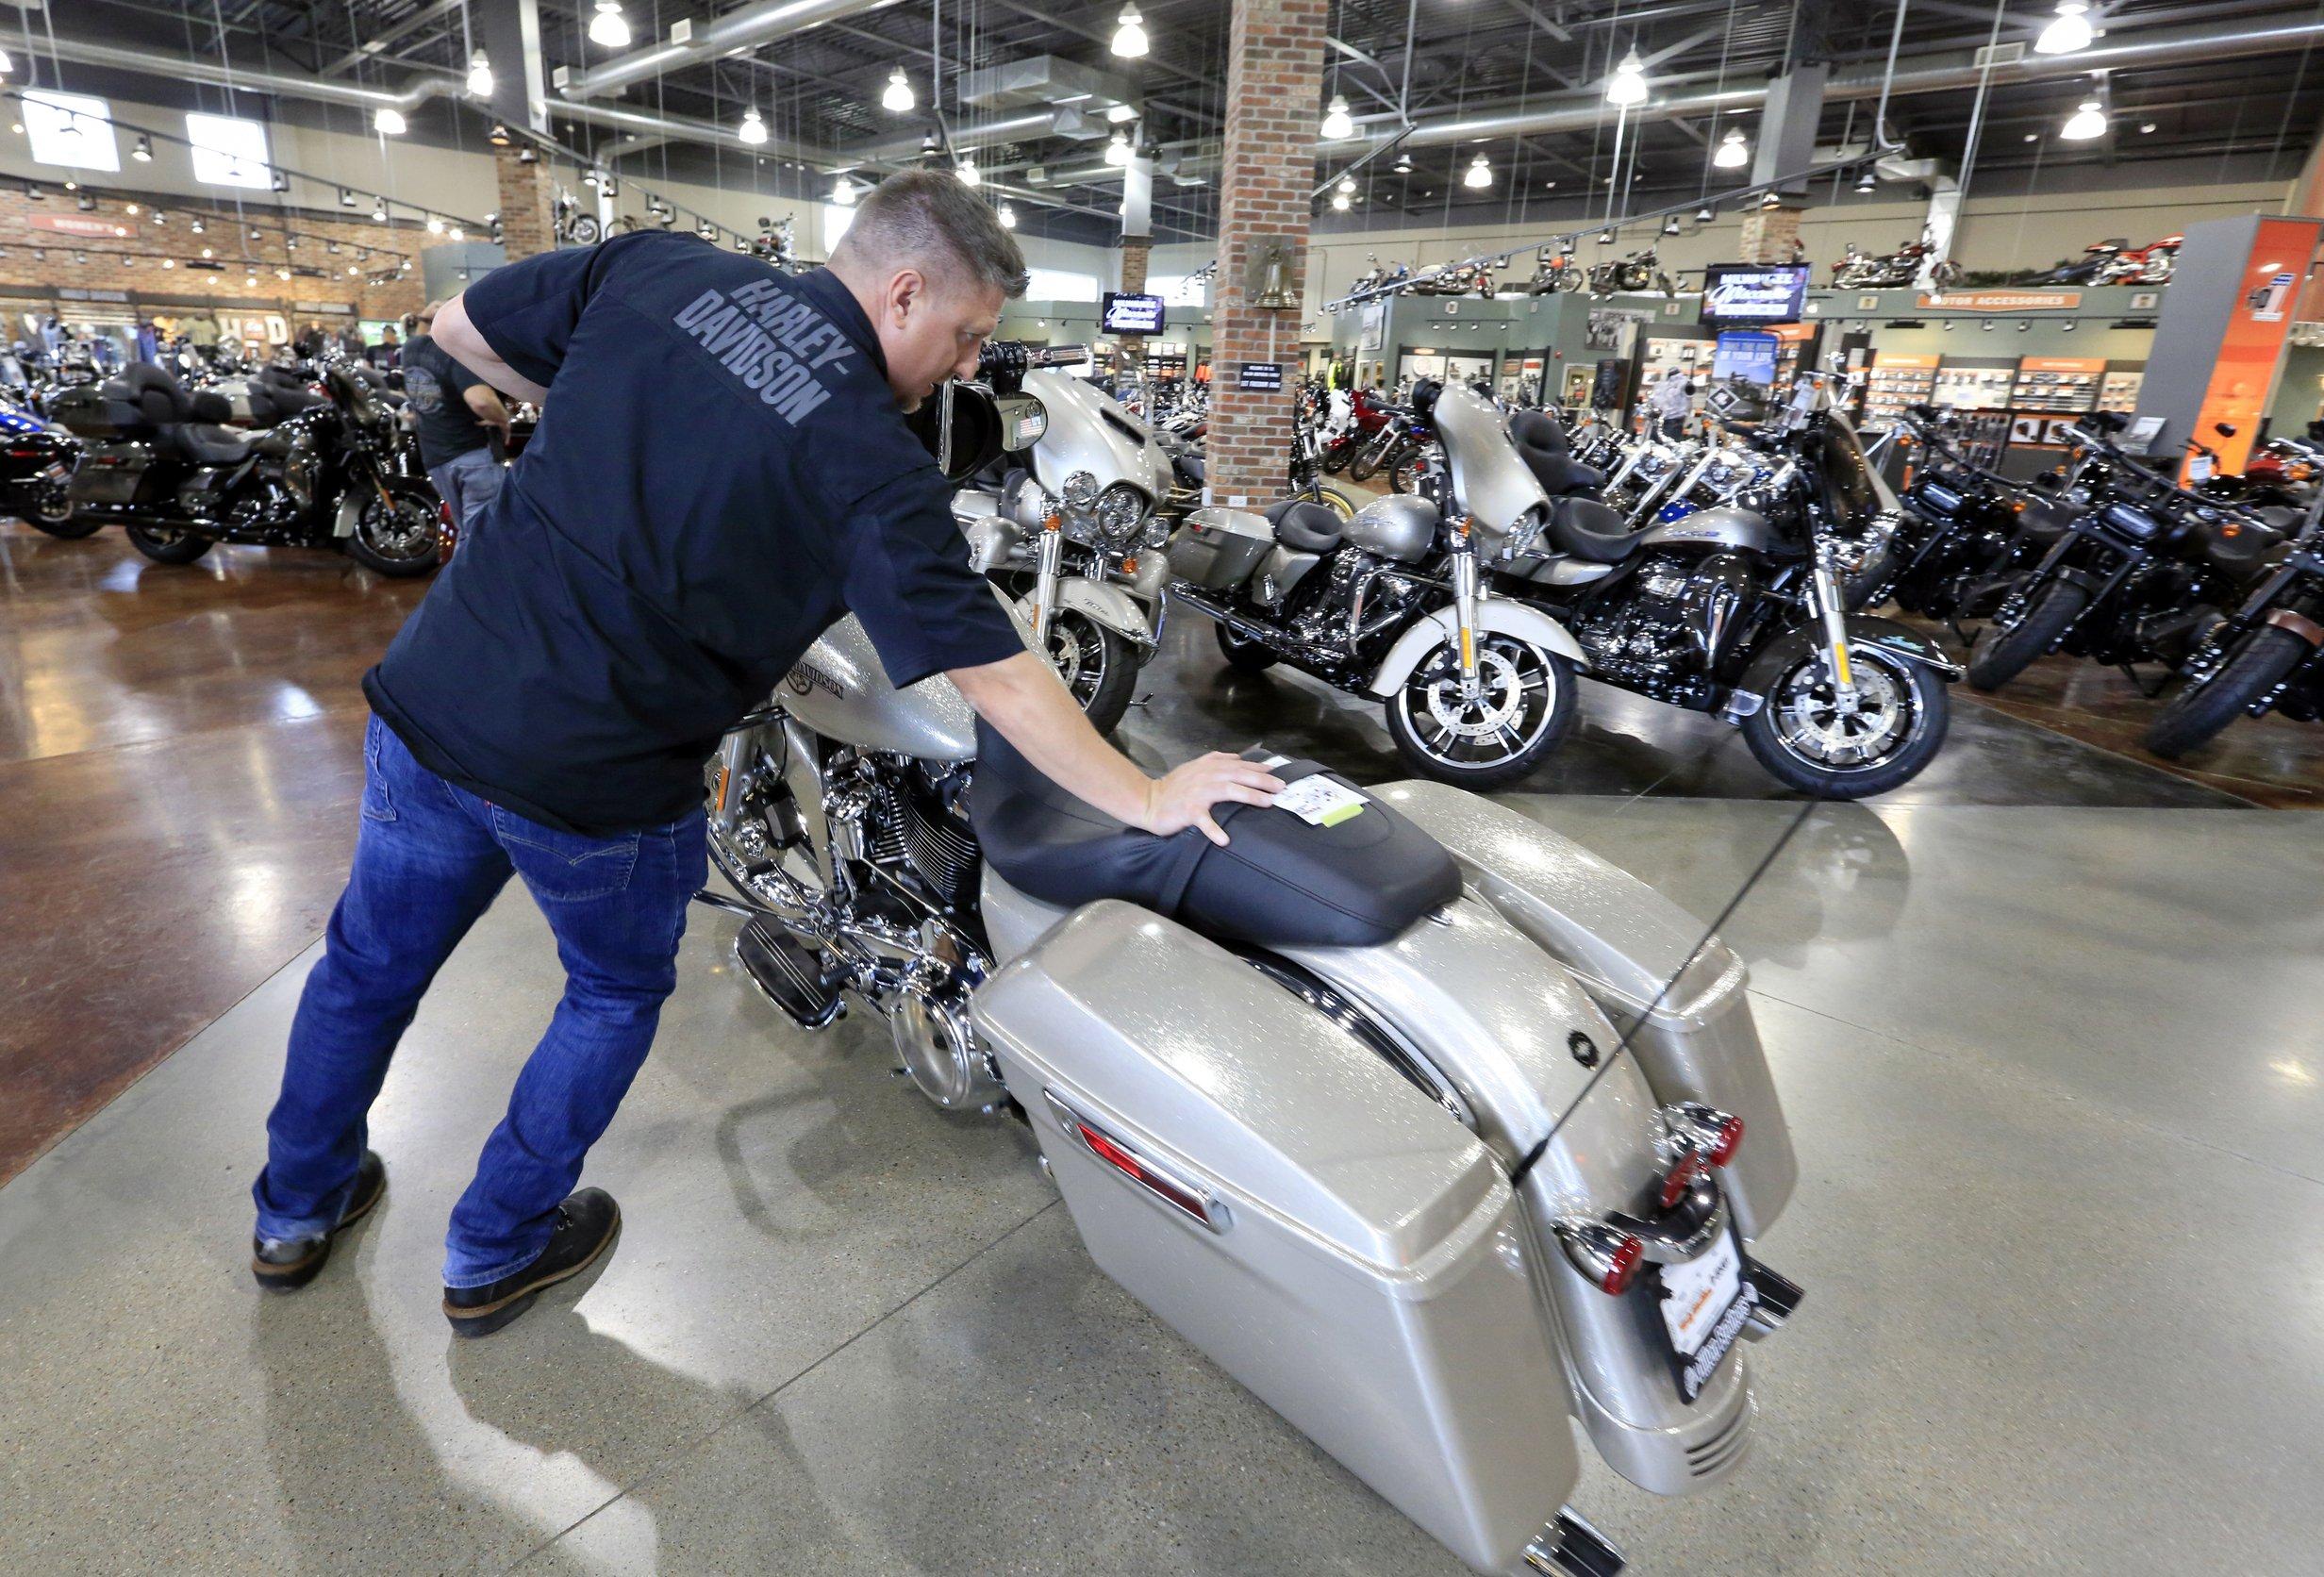 Harley Motorcycles For Sale >> Harley Davidson Tops Estimates But Sales Decline